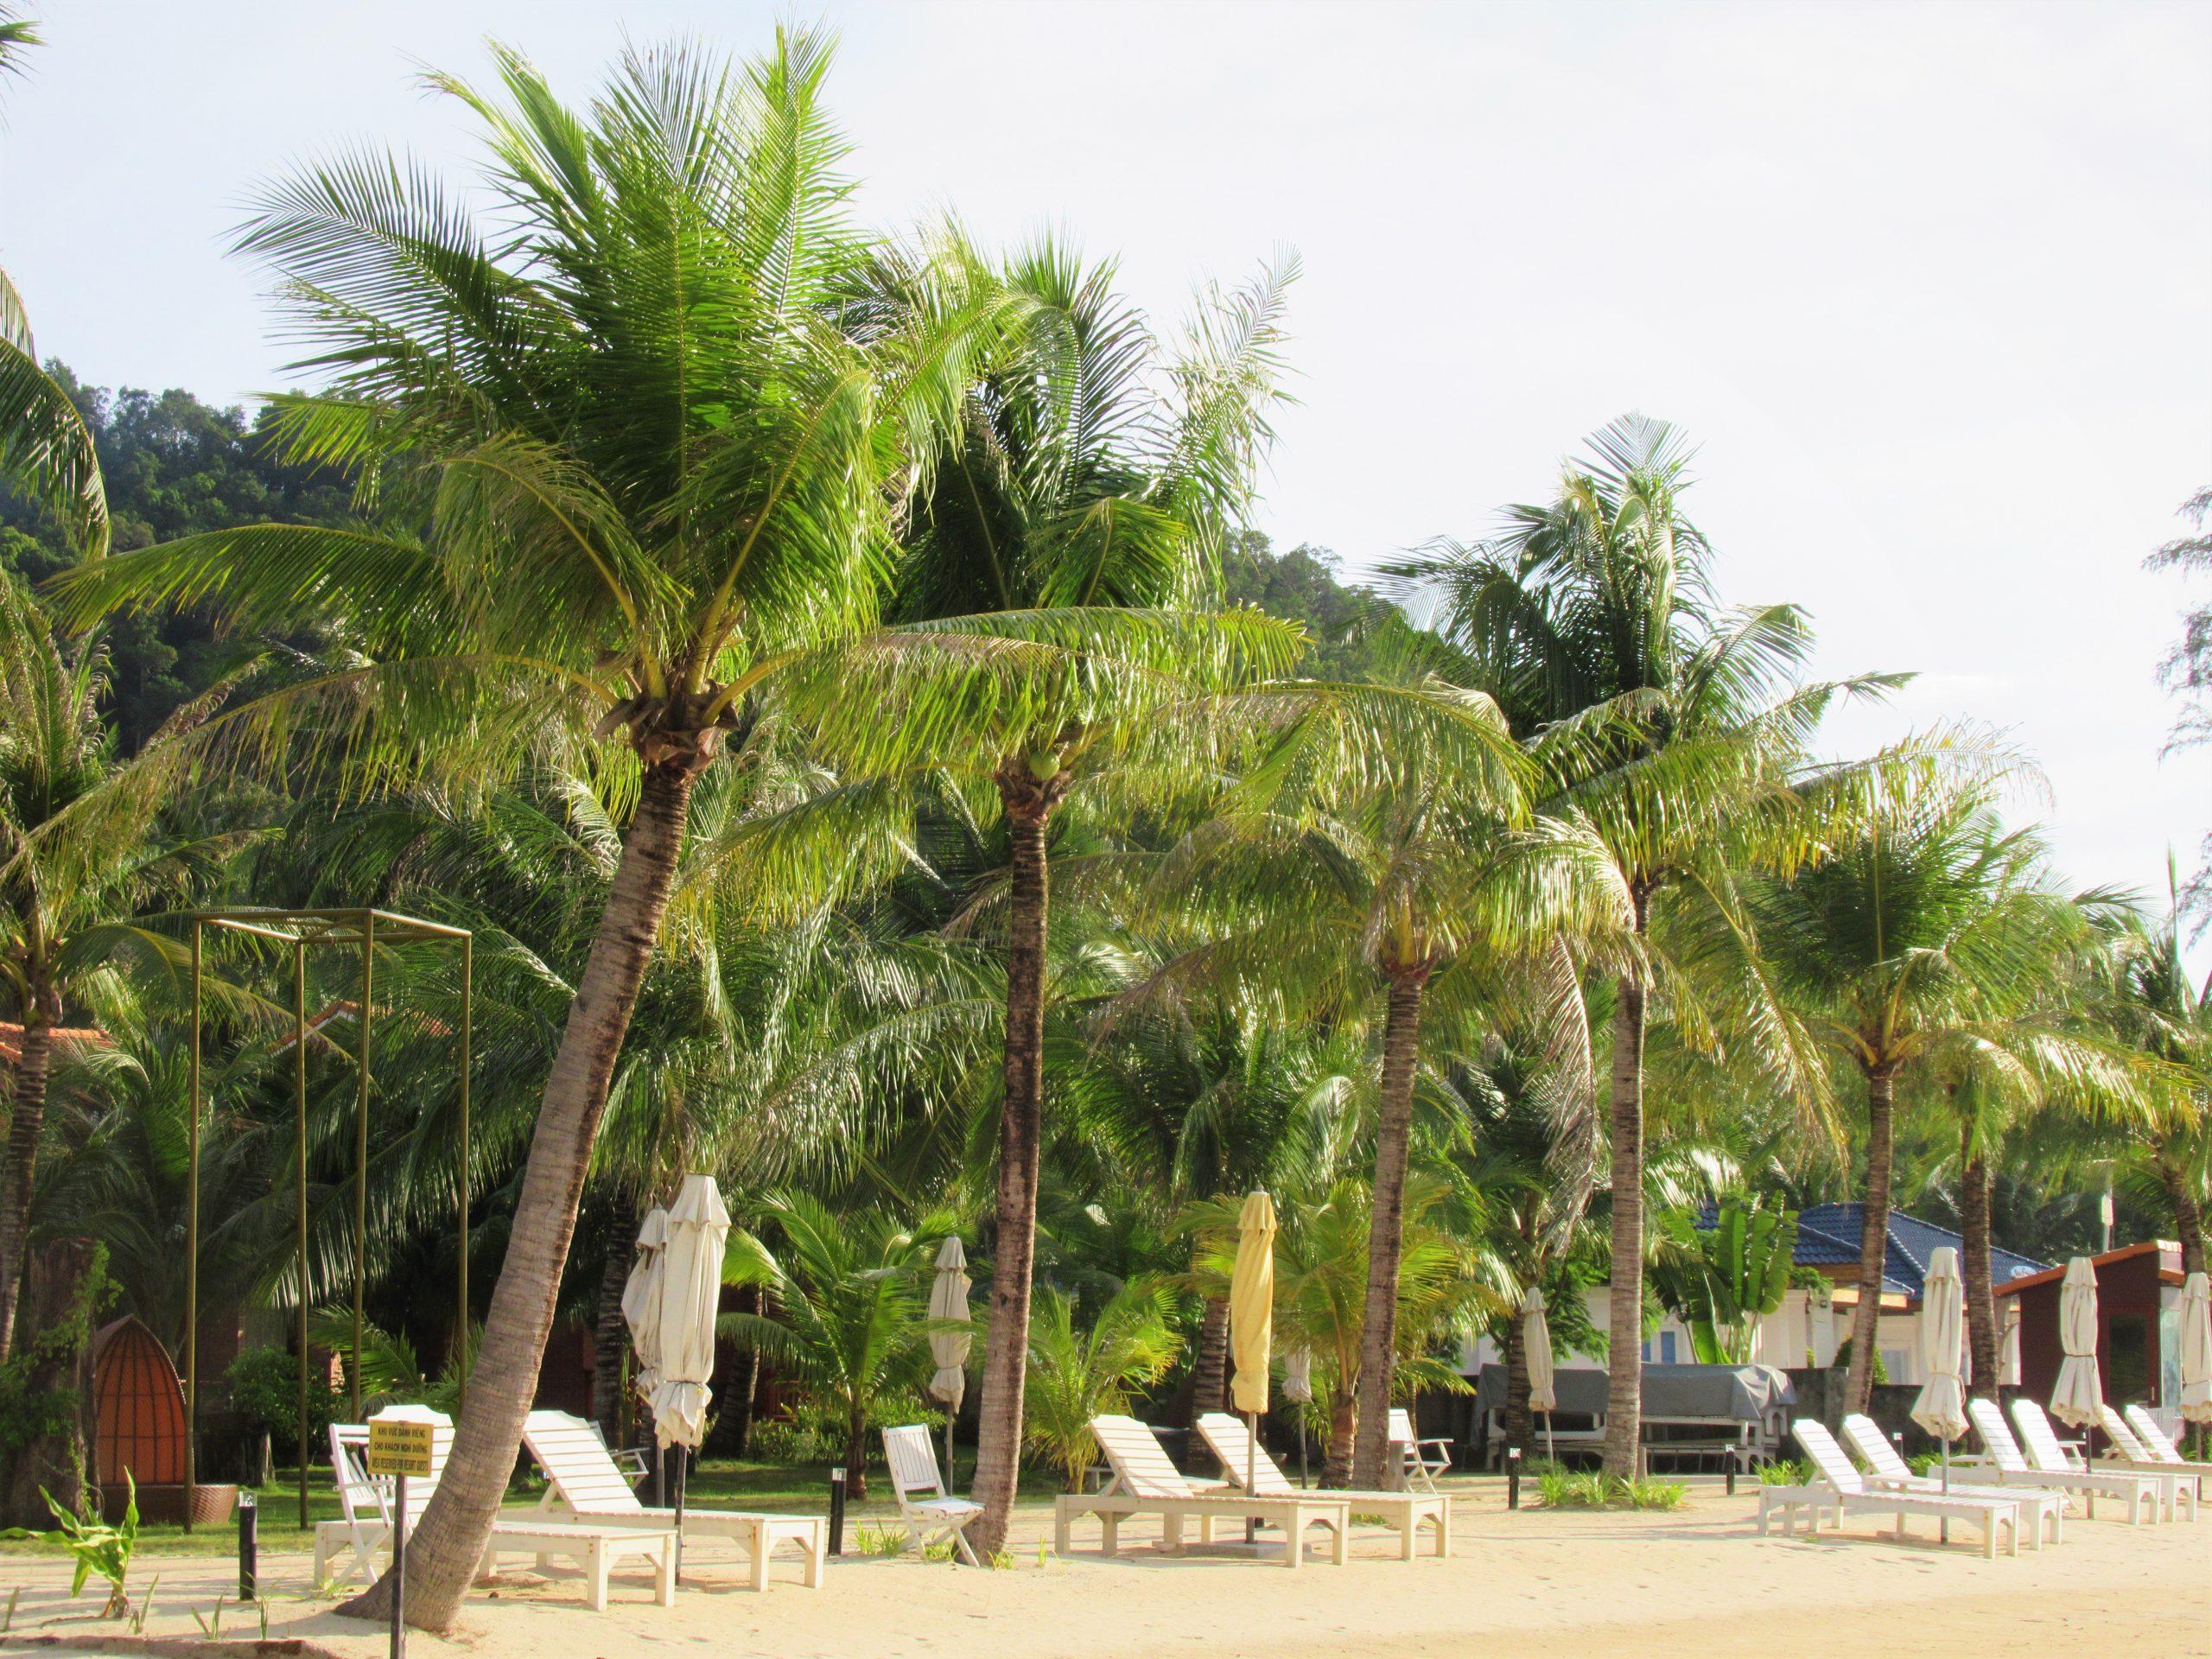 Beach at Gold Coast Resort, Phu Quoc Island, Vietnam